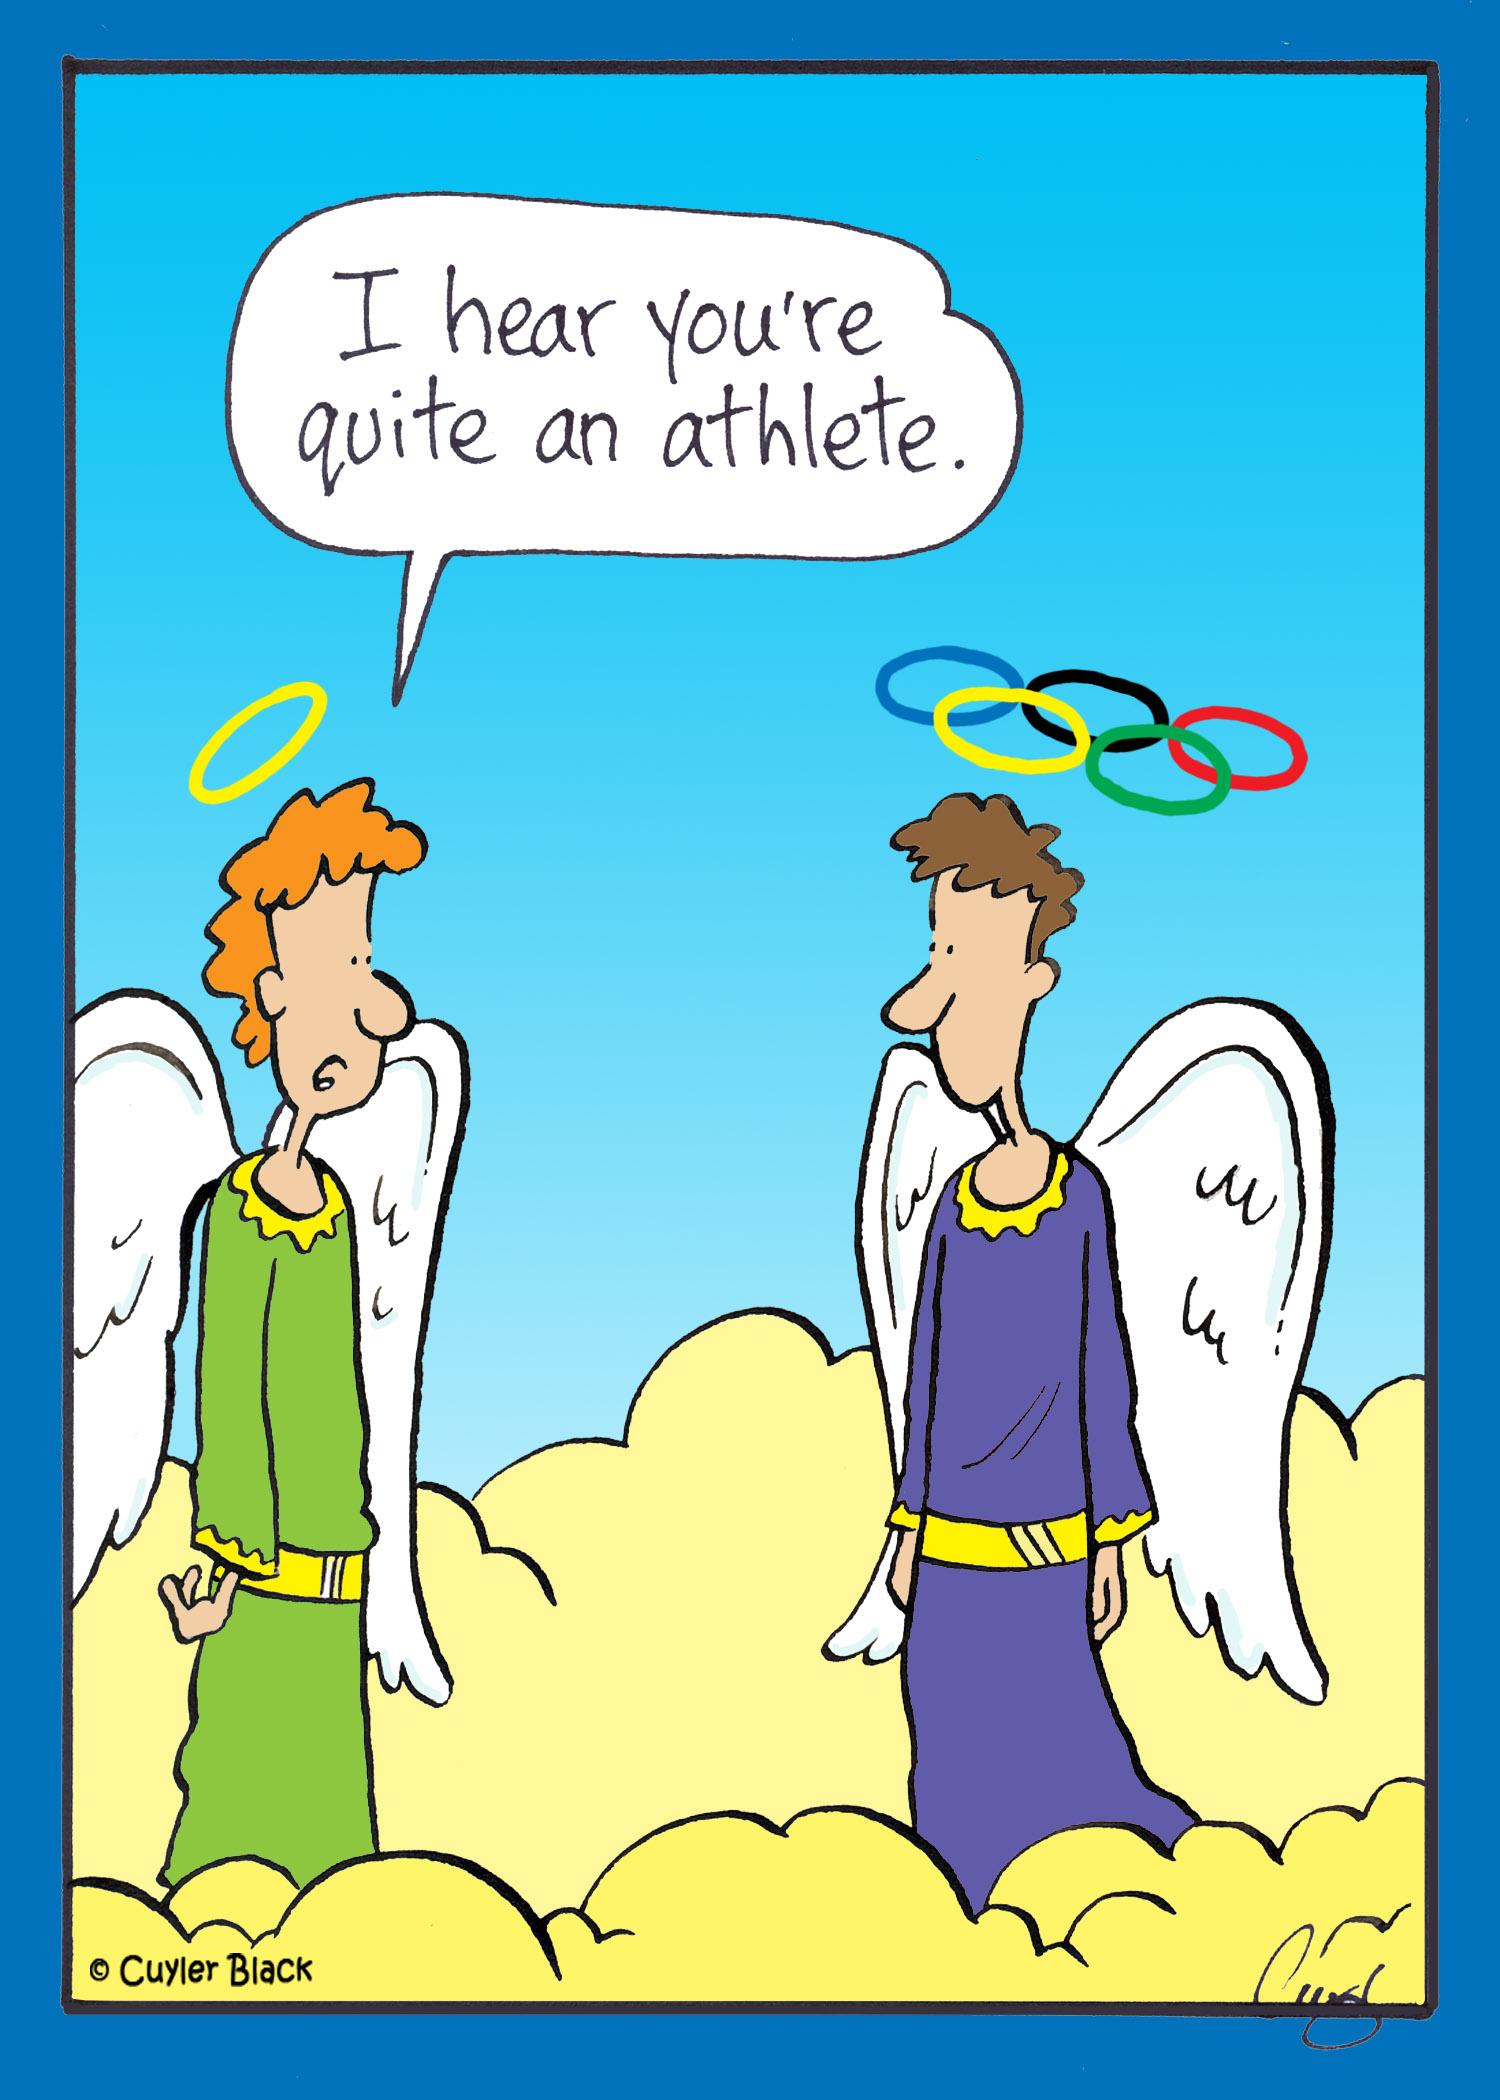 quite an athlete.jpg